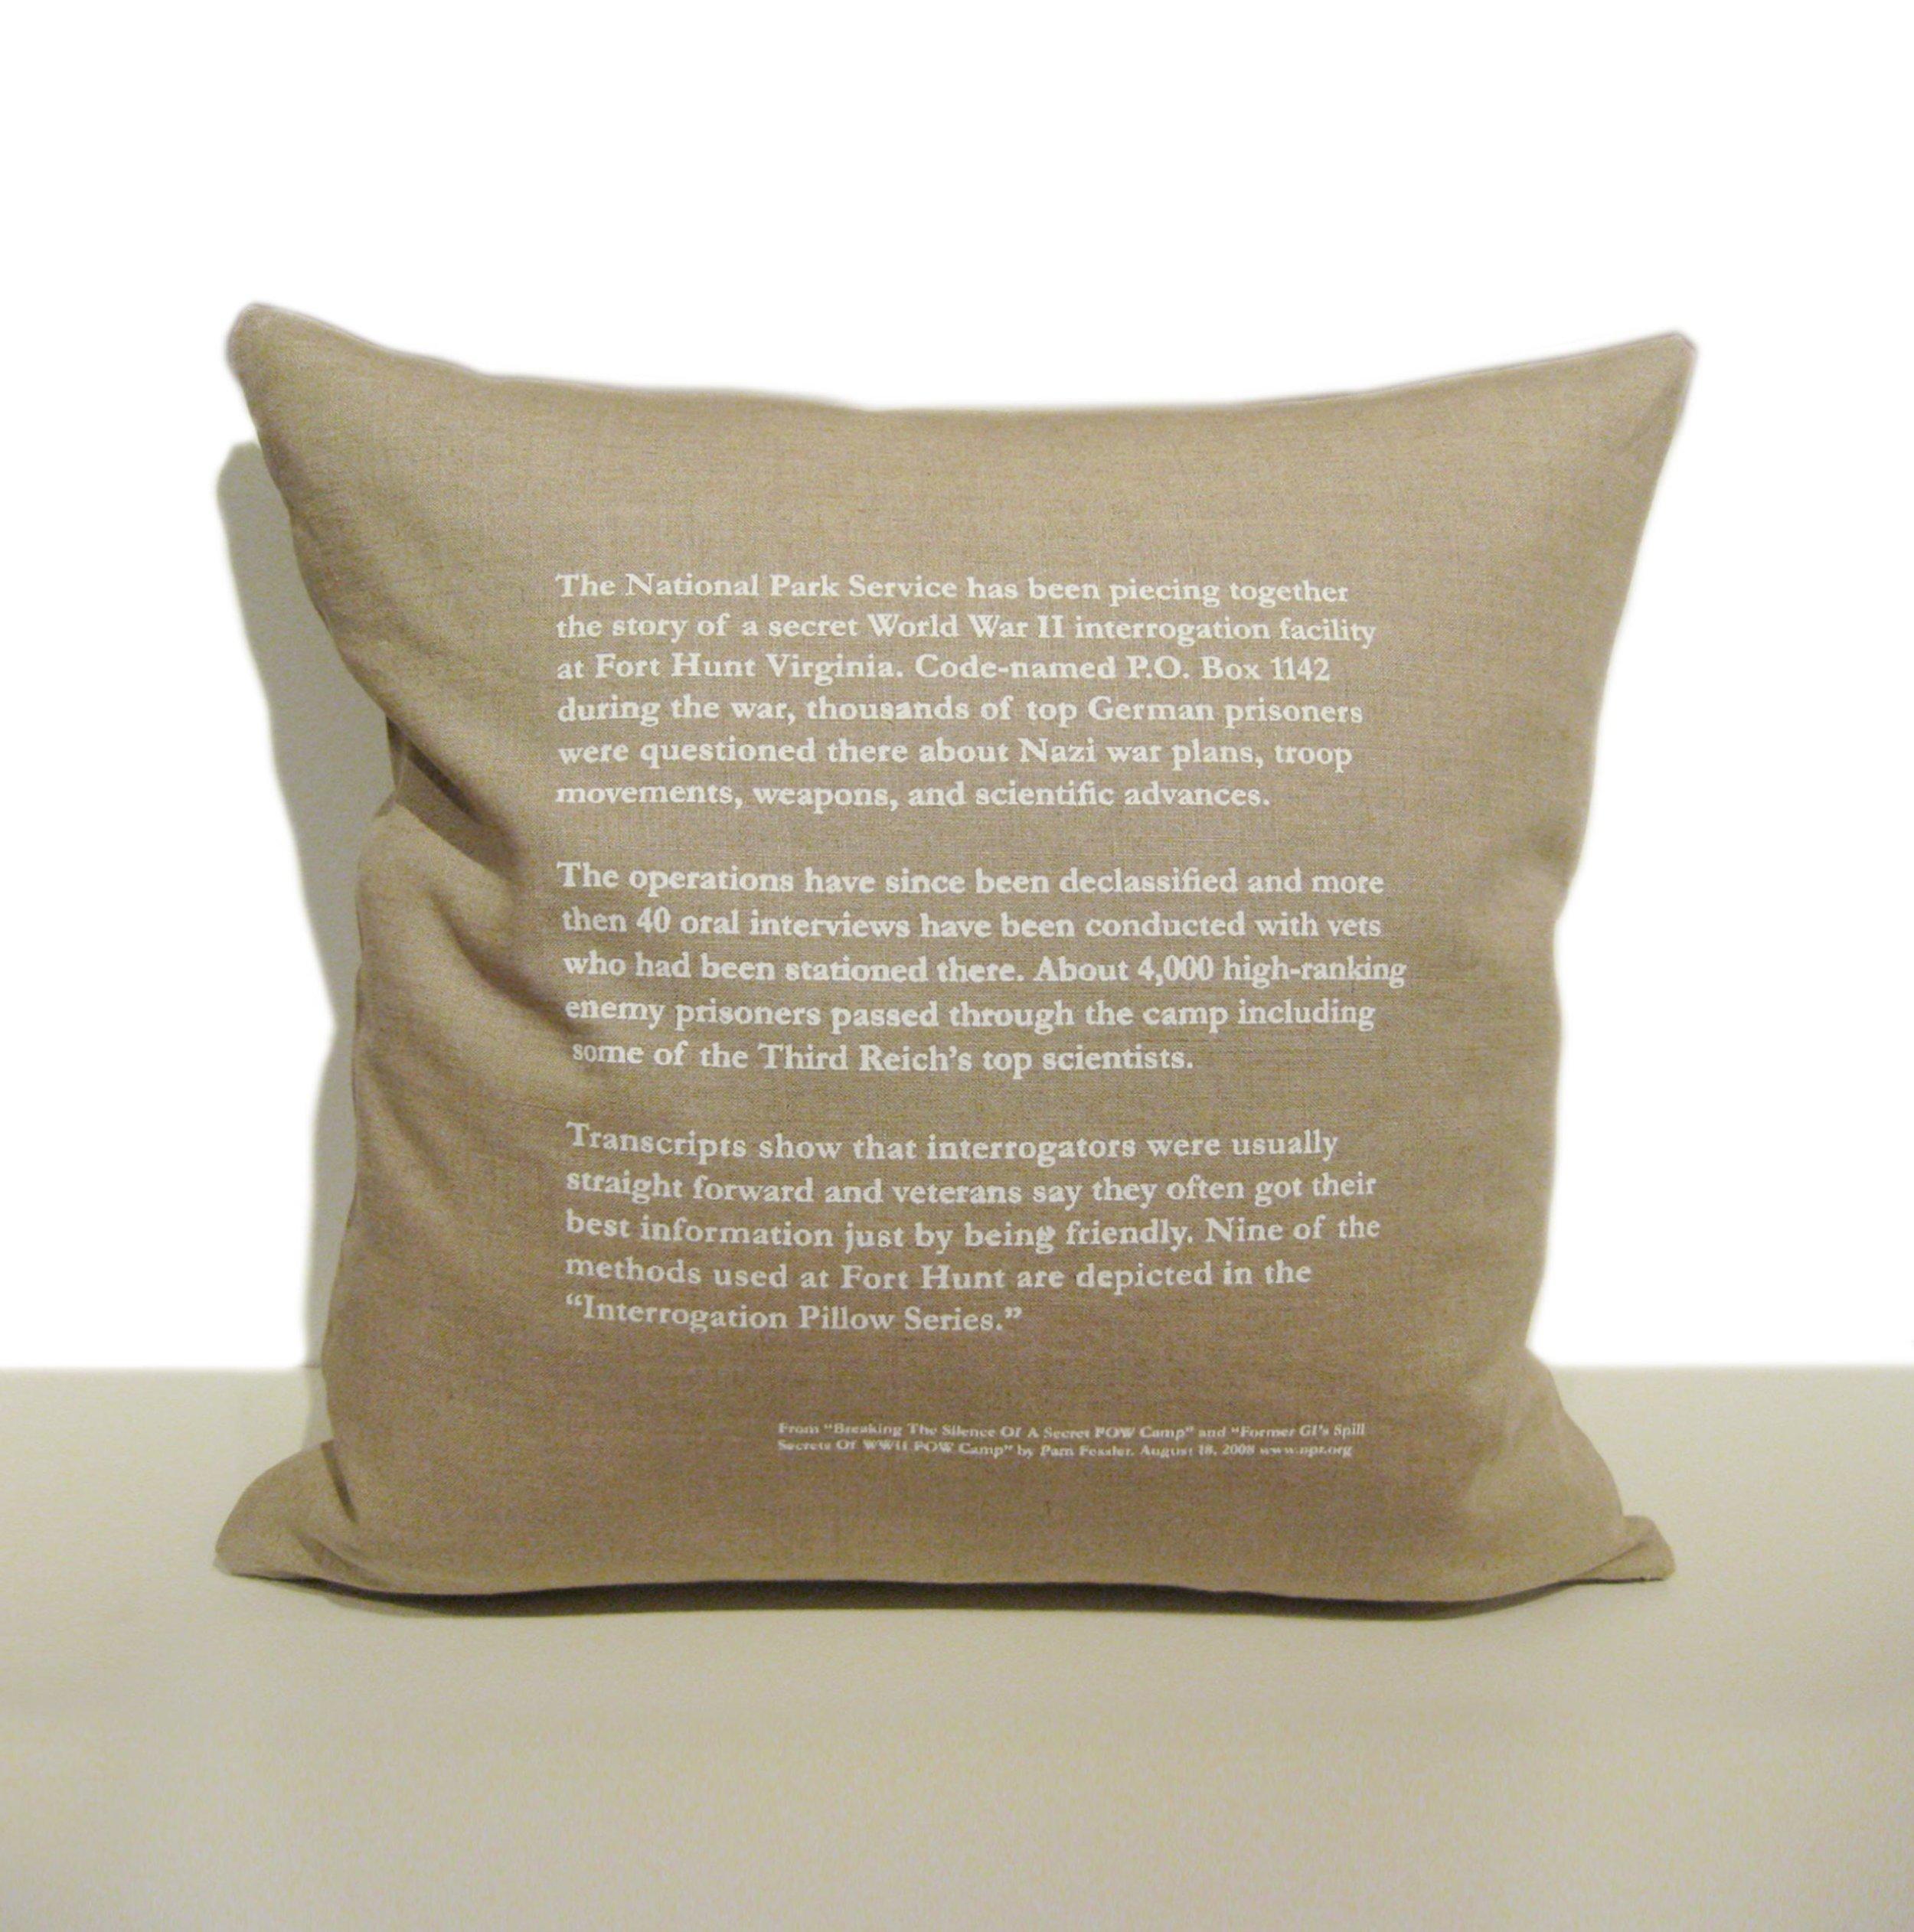 Interrogation Pillow Series  Back view of pillows